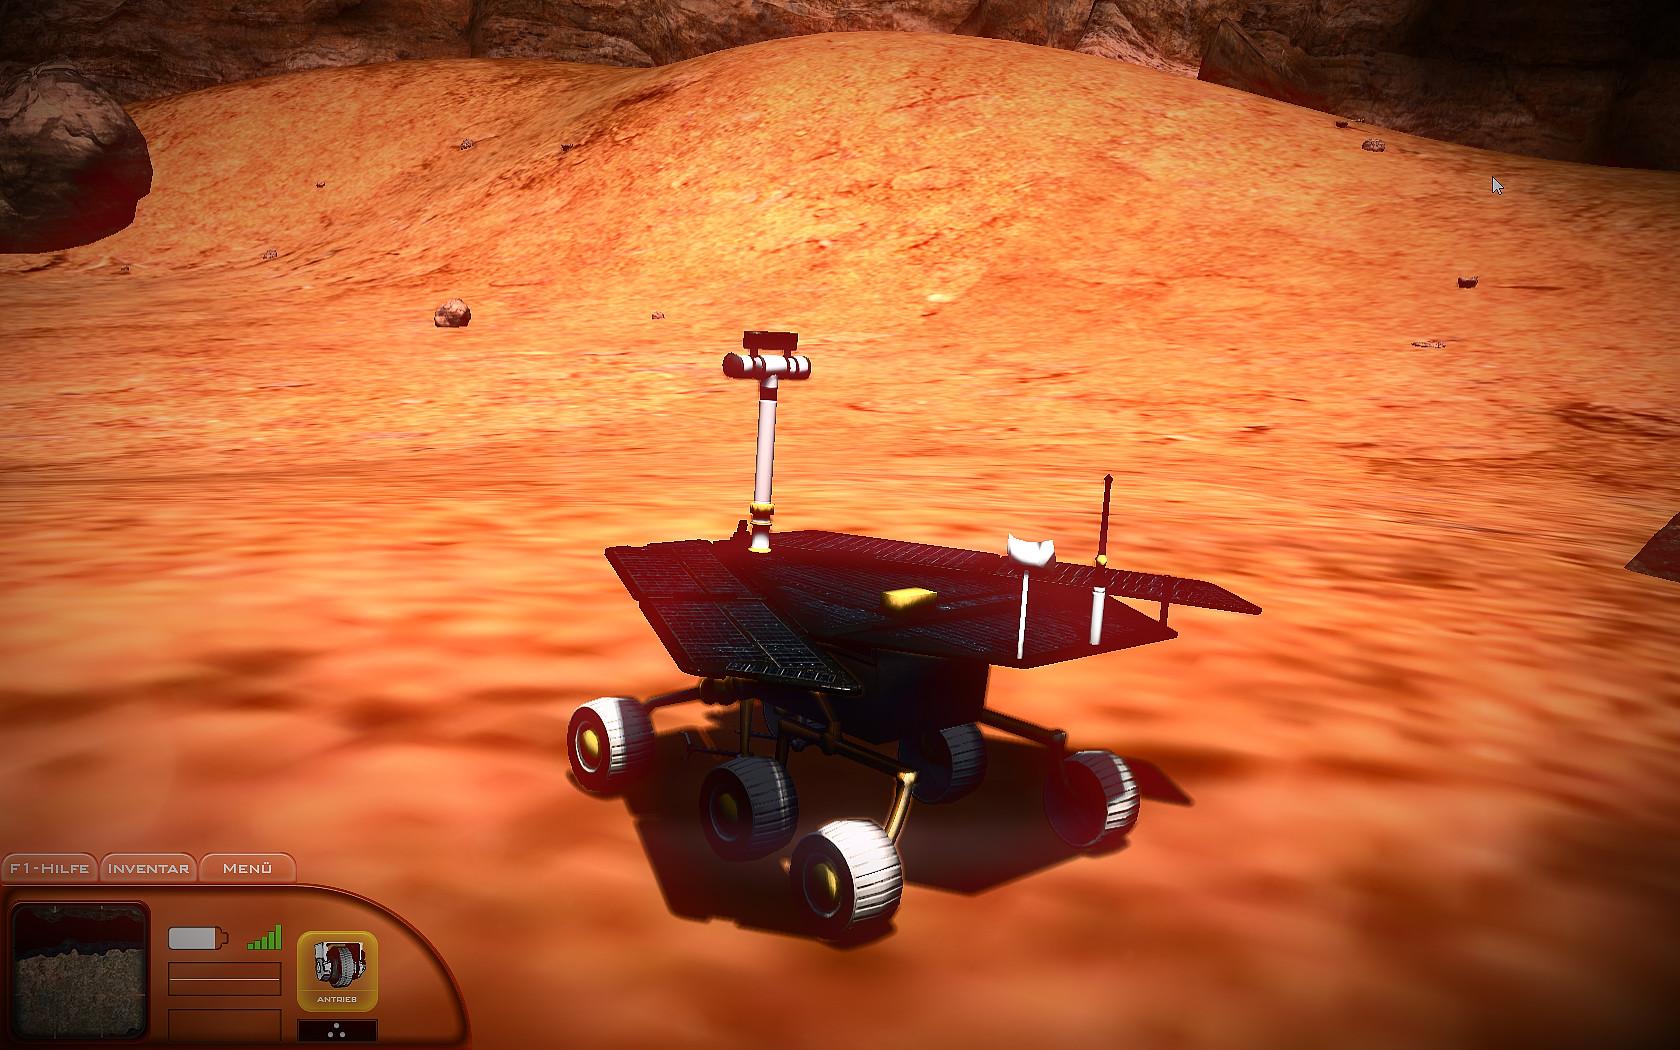 mars rover simulator - photo #16